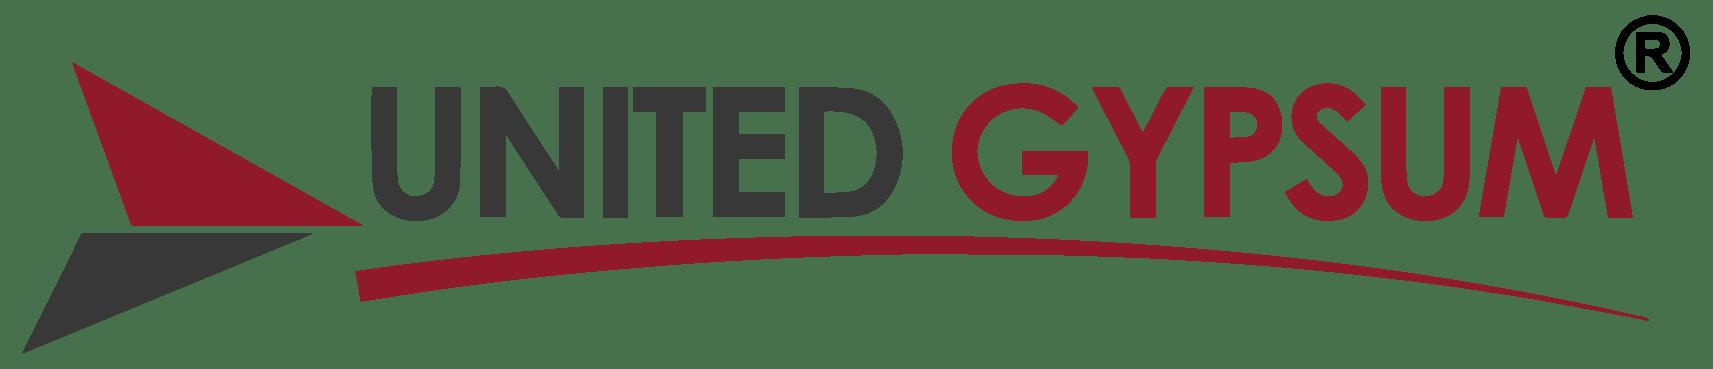 United Gypsum